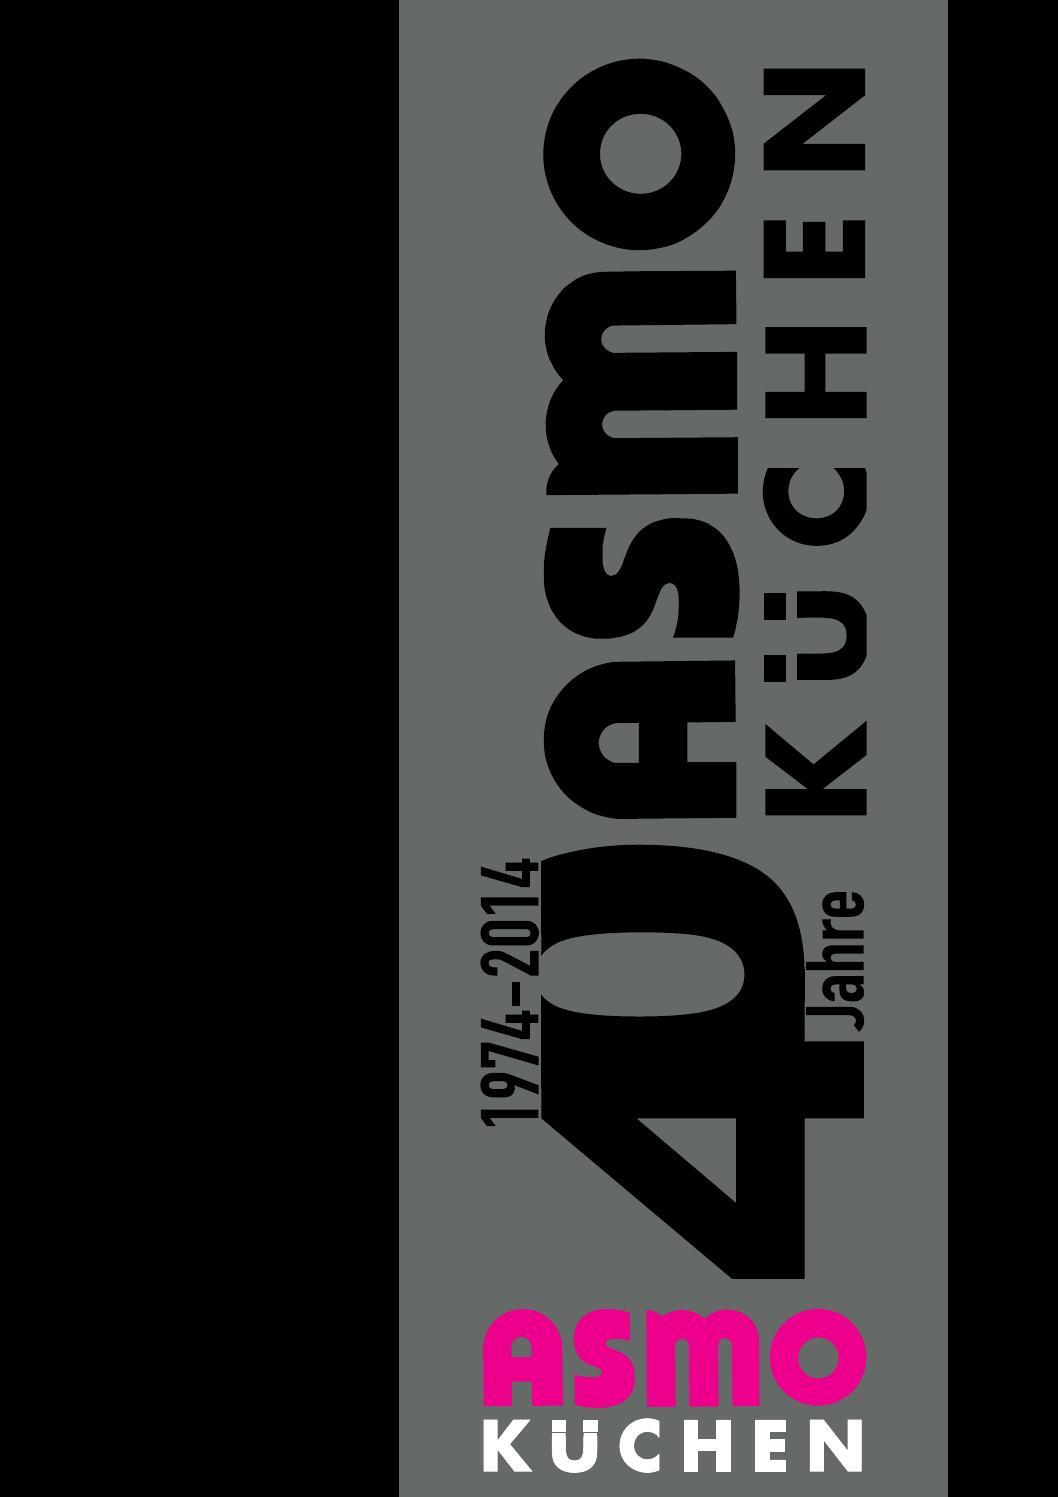 asmo k chen jubil umsbuch 2014 by steffen kley issuu. Black Bedroom Furniture Sets. Home Design Ideas